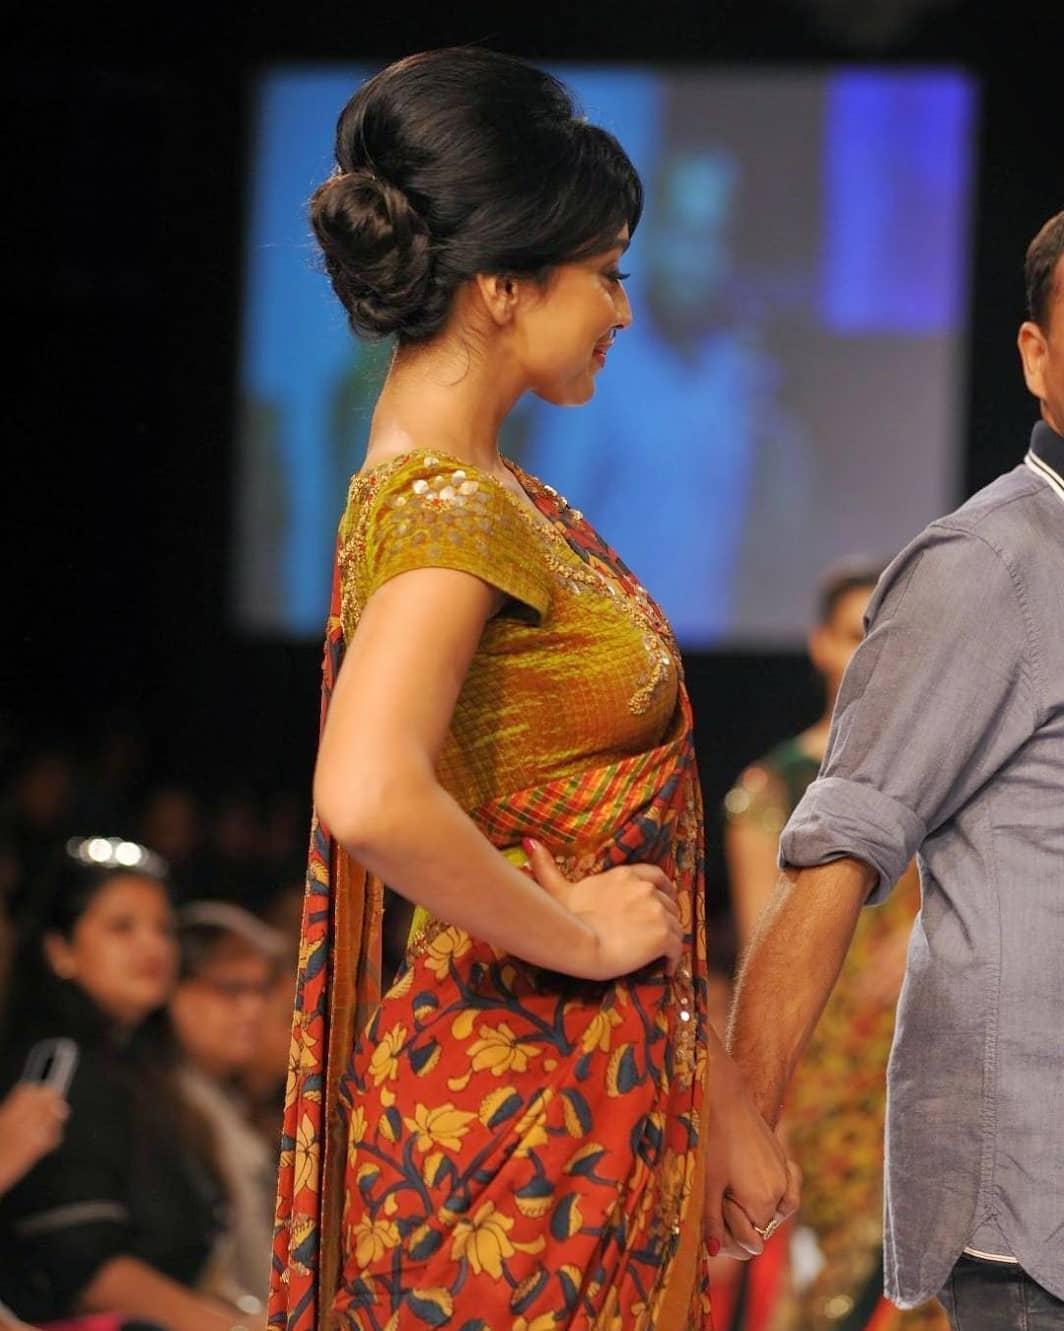 Shriya Saran Looks Super Sexy On The Ramp Wearing A Revealing Saree